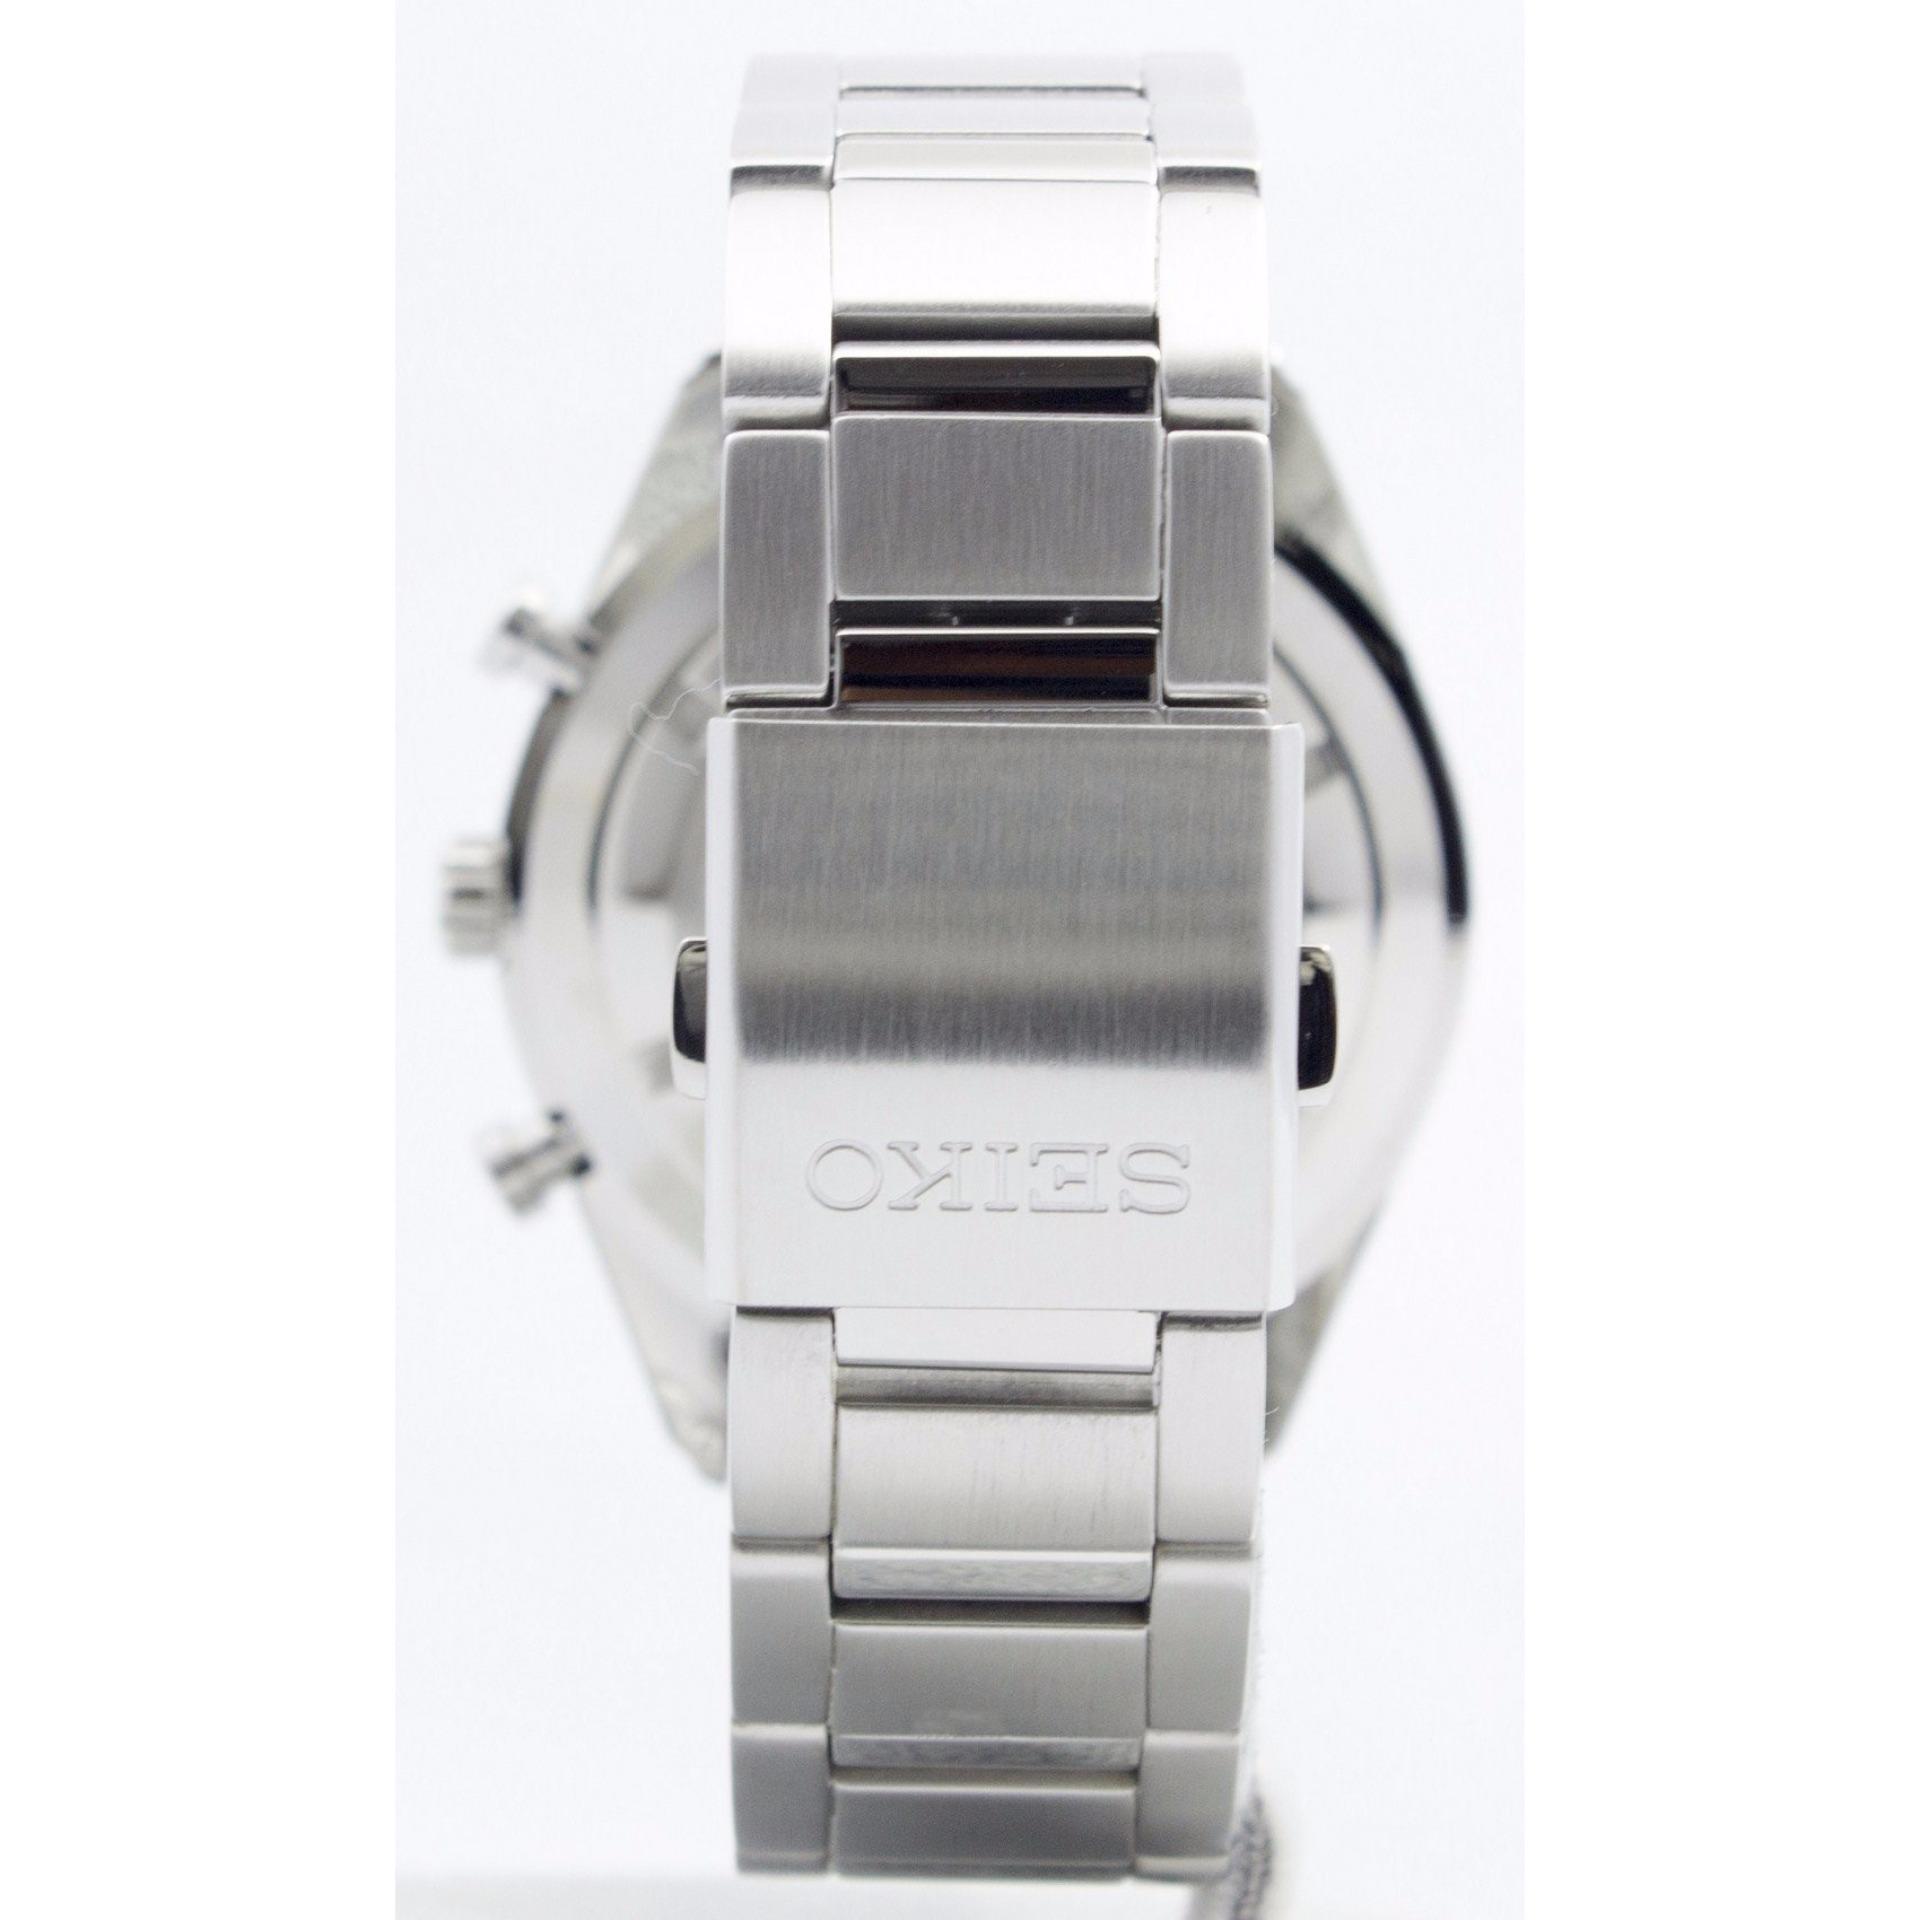 Seiko Chronograph Jam Tangan Strap Stainless Steel Silver Sks515p1 Sks521p1 Pria Stell Ssb175p1 Black